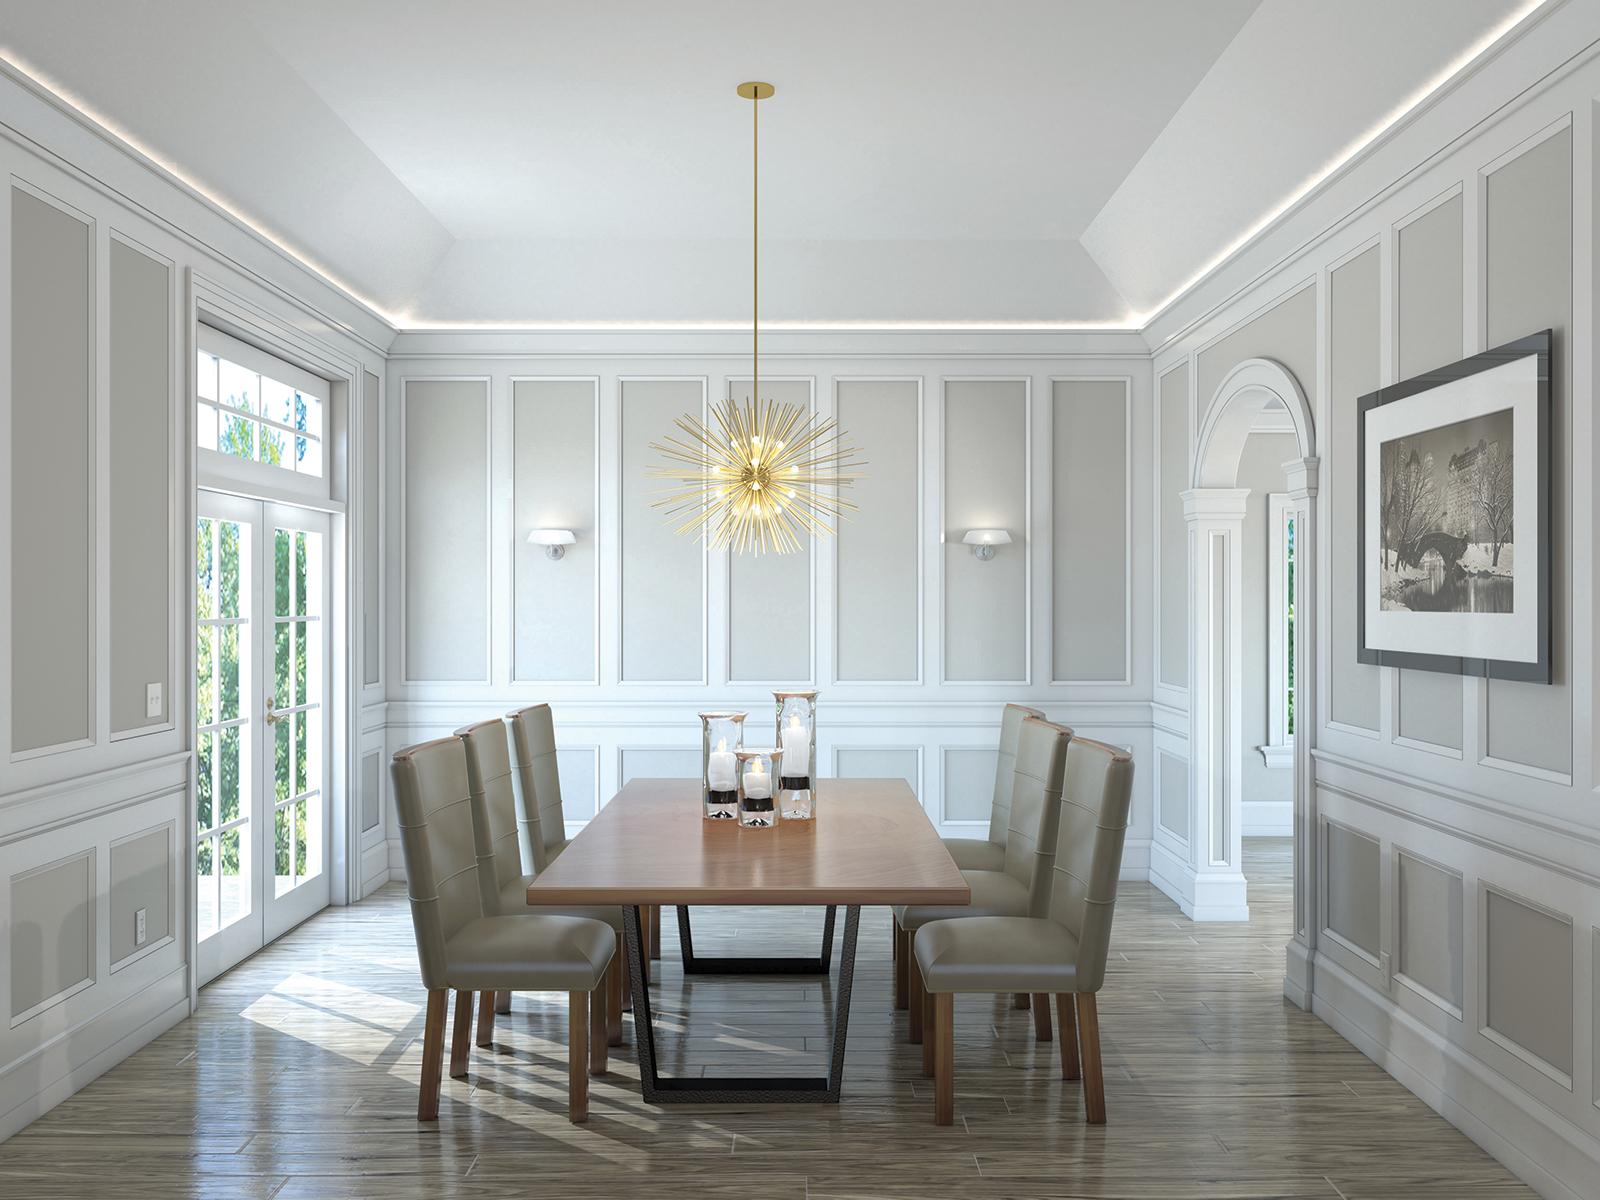 The Kensington – Metro Dining Room